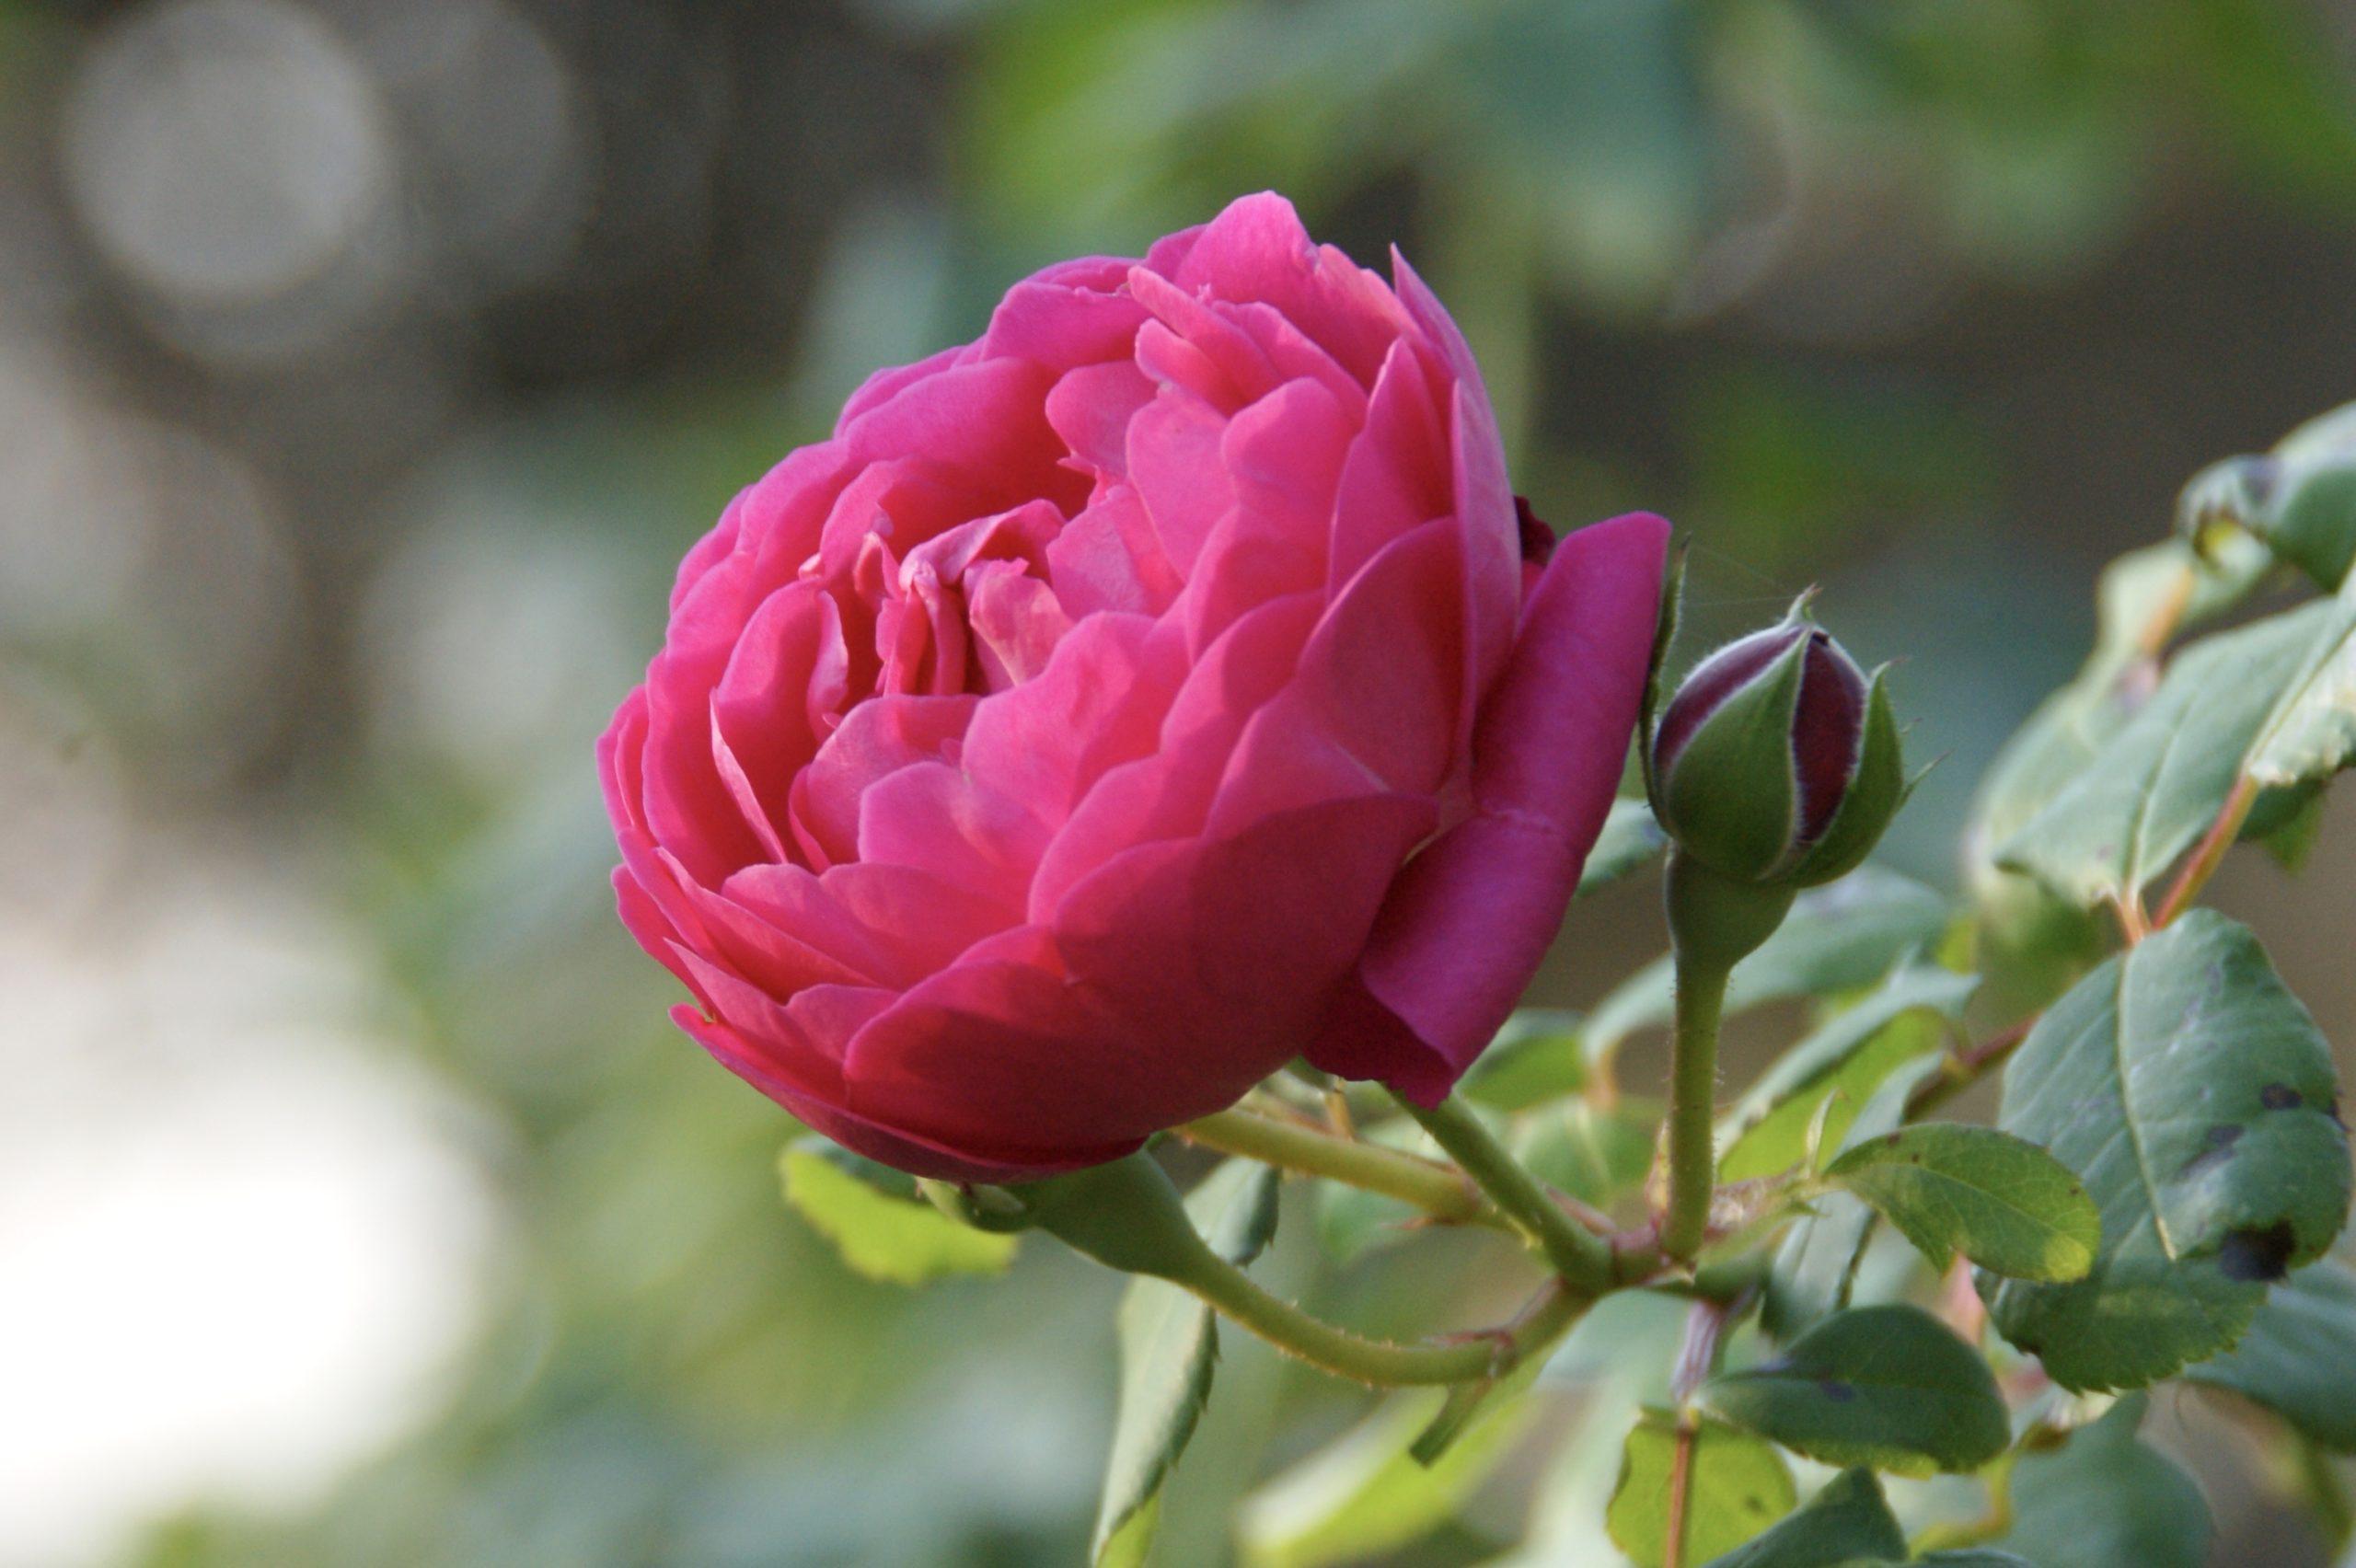 Rosier Cybelle®, en coupe - Roses Guillot®